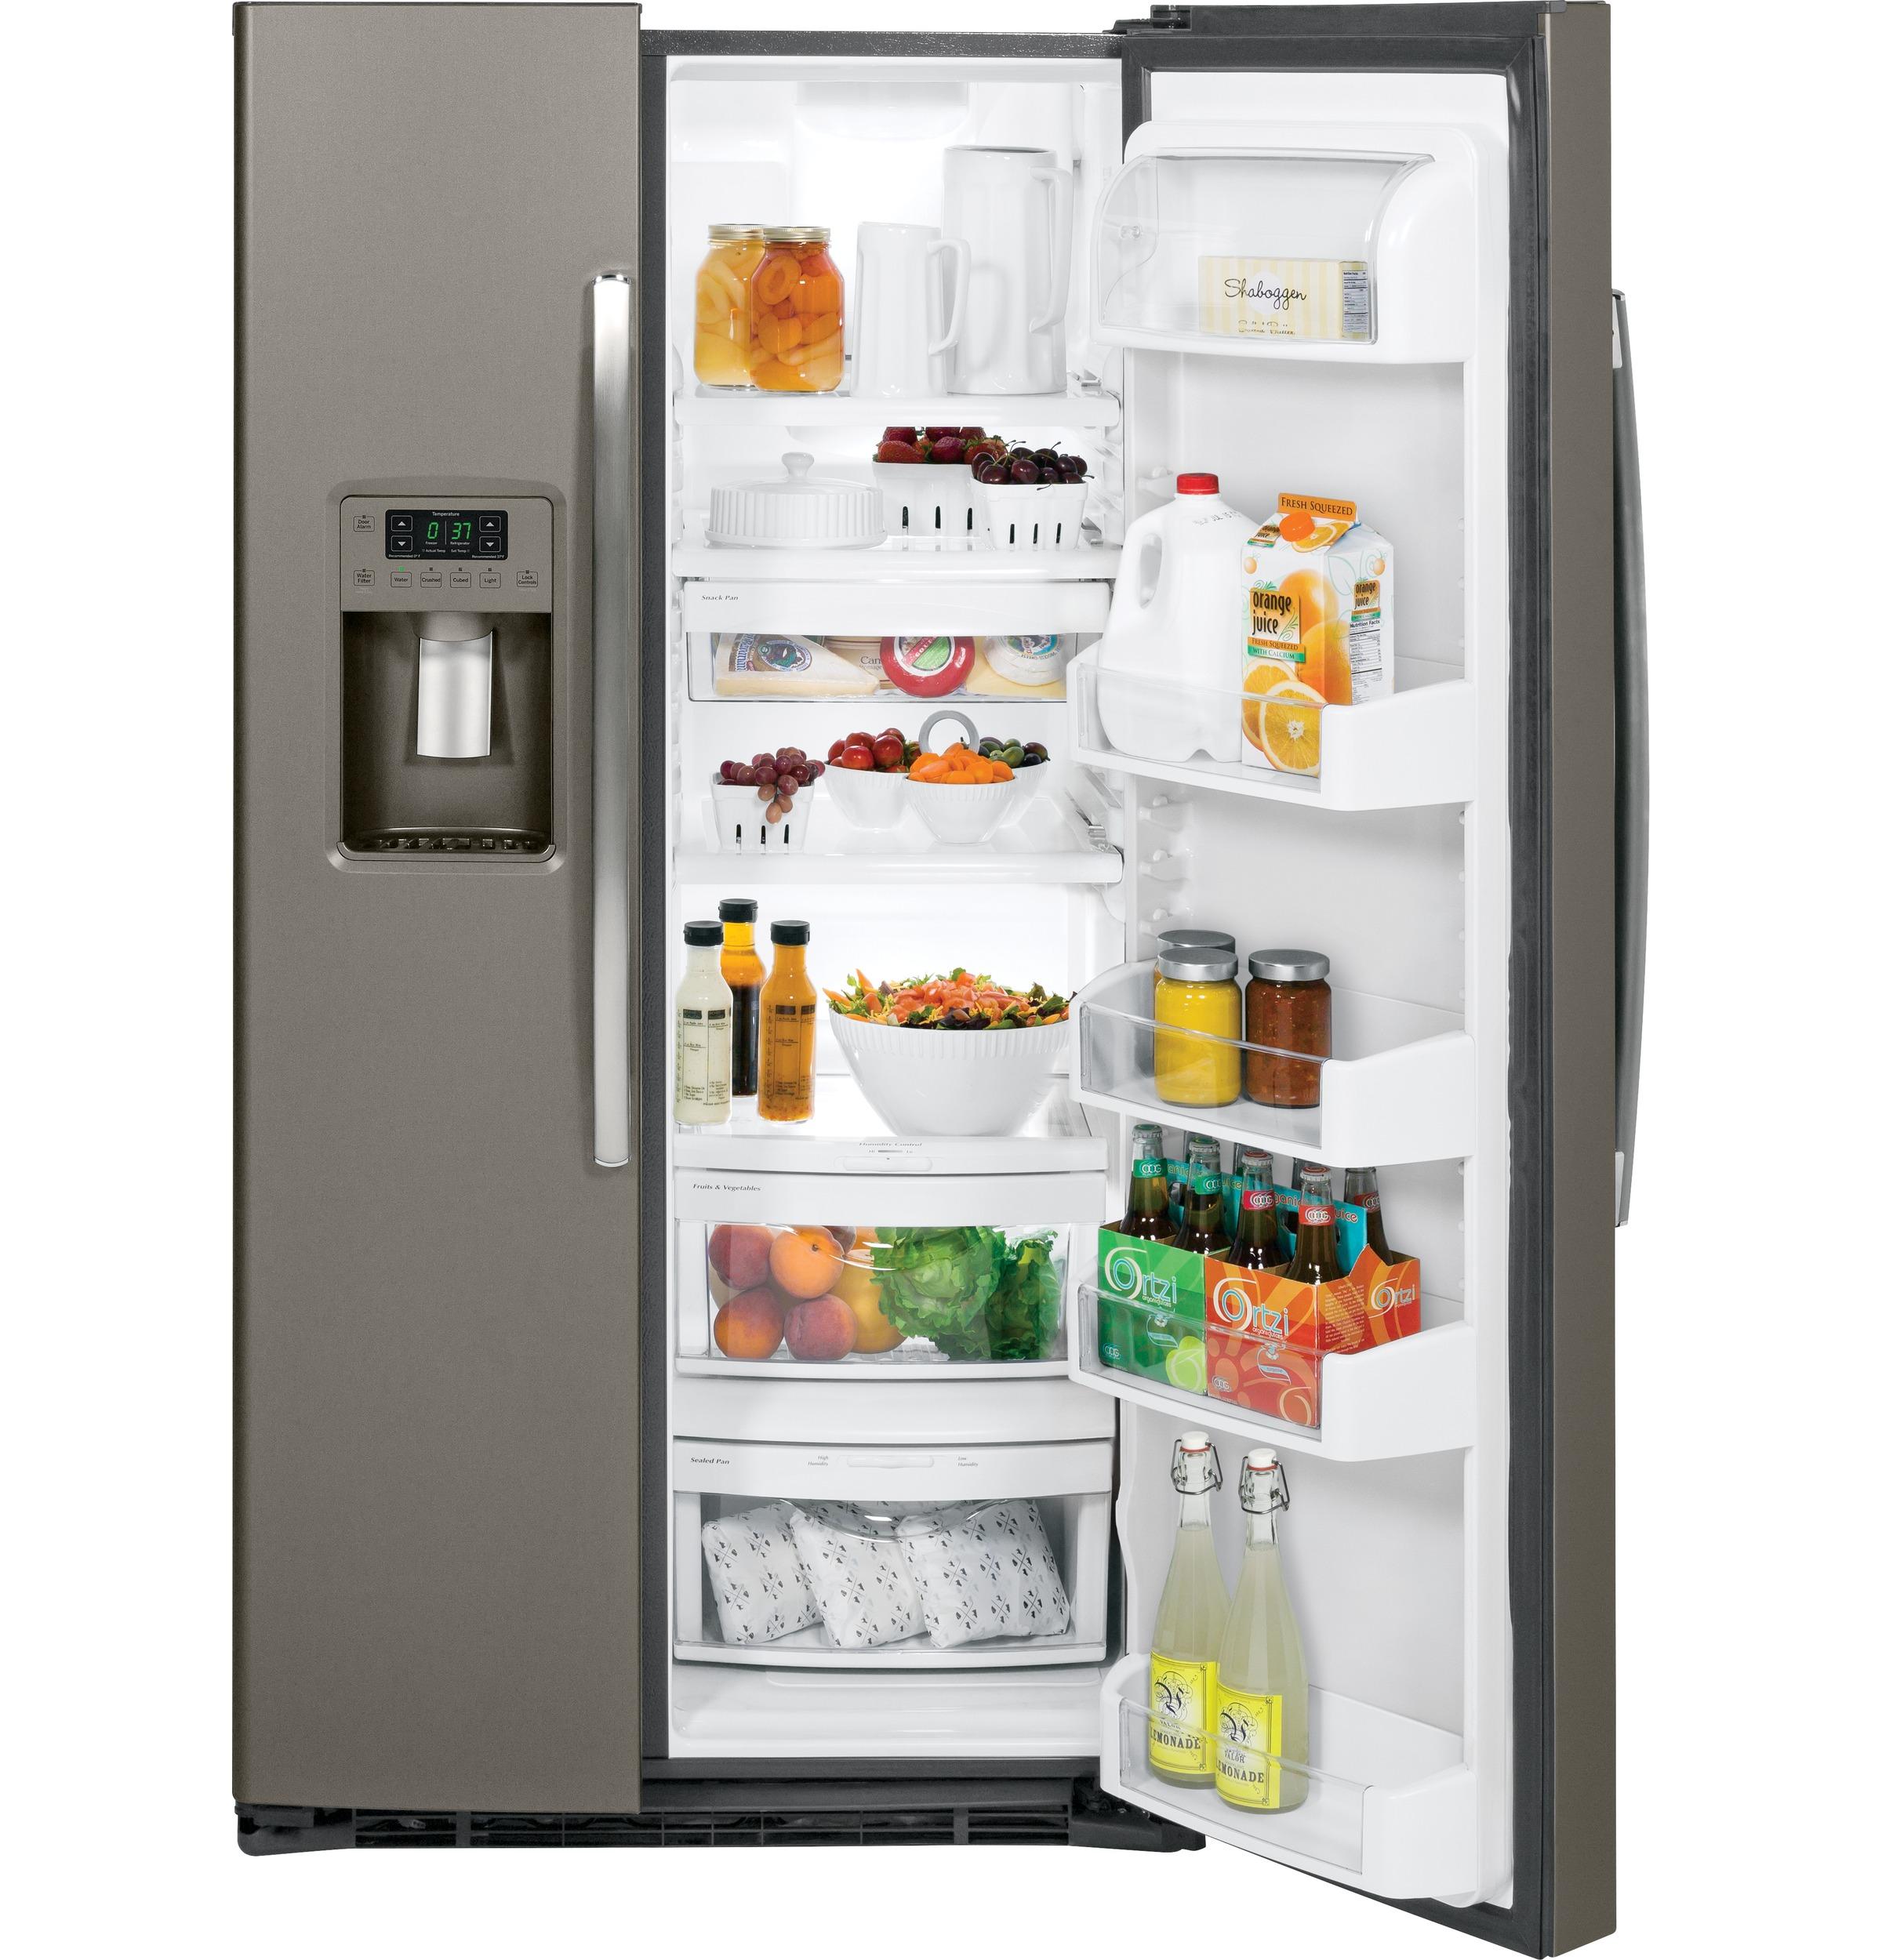 ge energy star 25 4 cu ft side by side refrigerator gse25hmh rh adaappliances com ge profile arctica refrigerator repair manual GE Counter-Depth Refrigerator Stainless